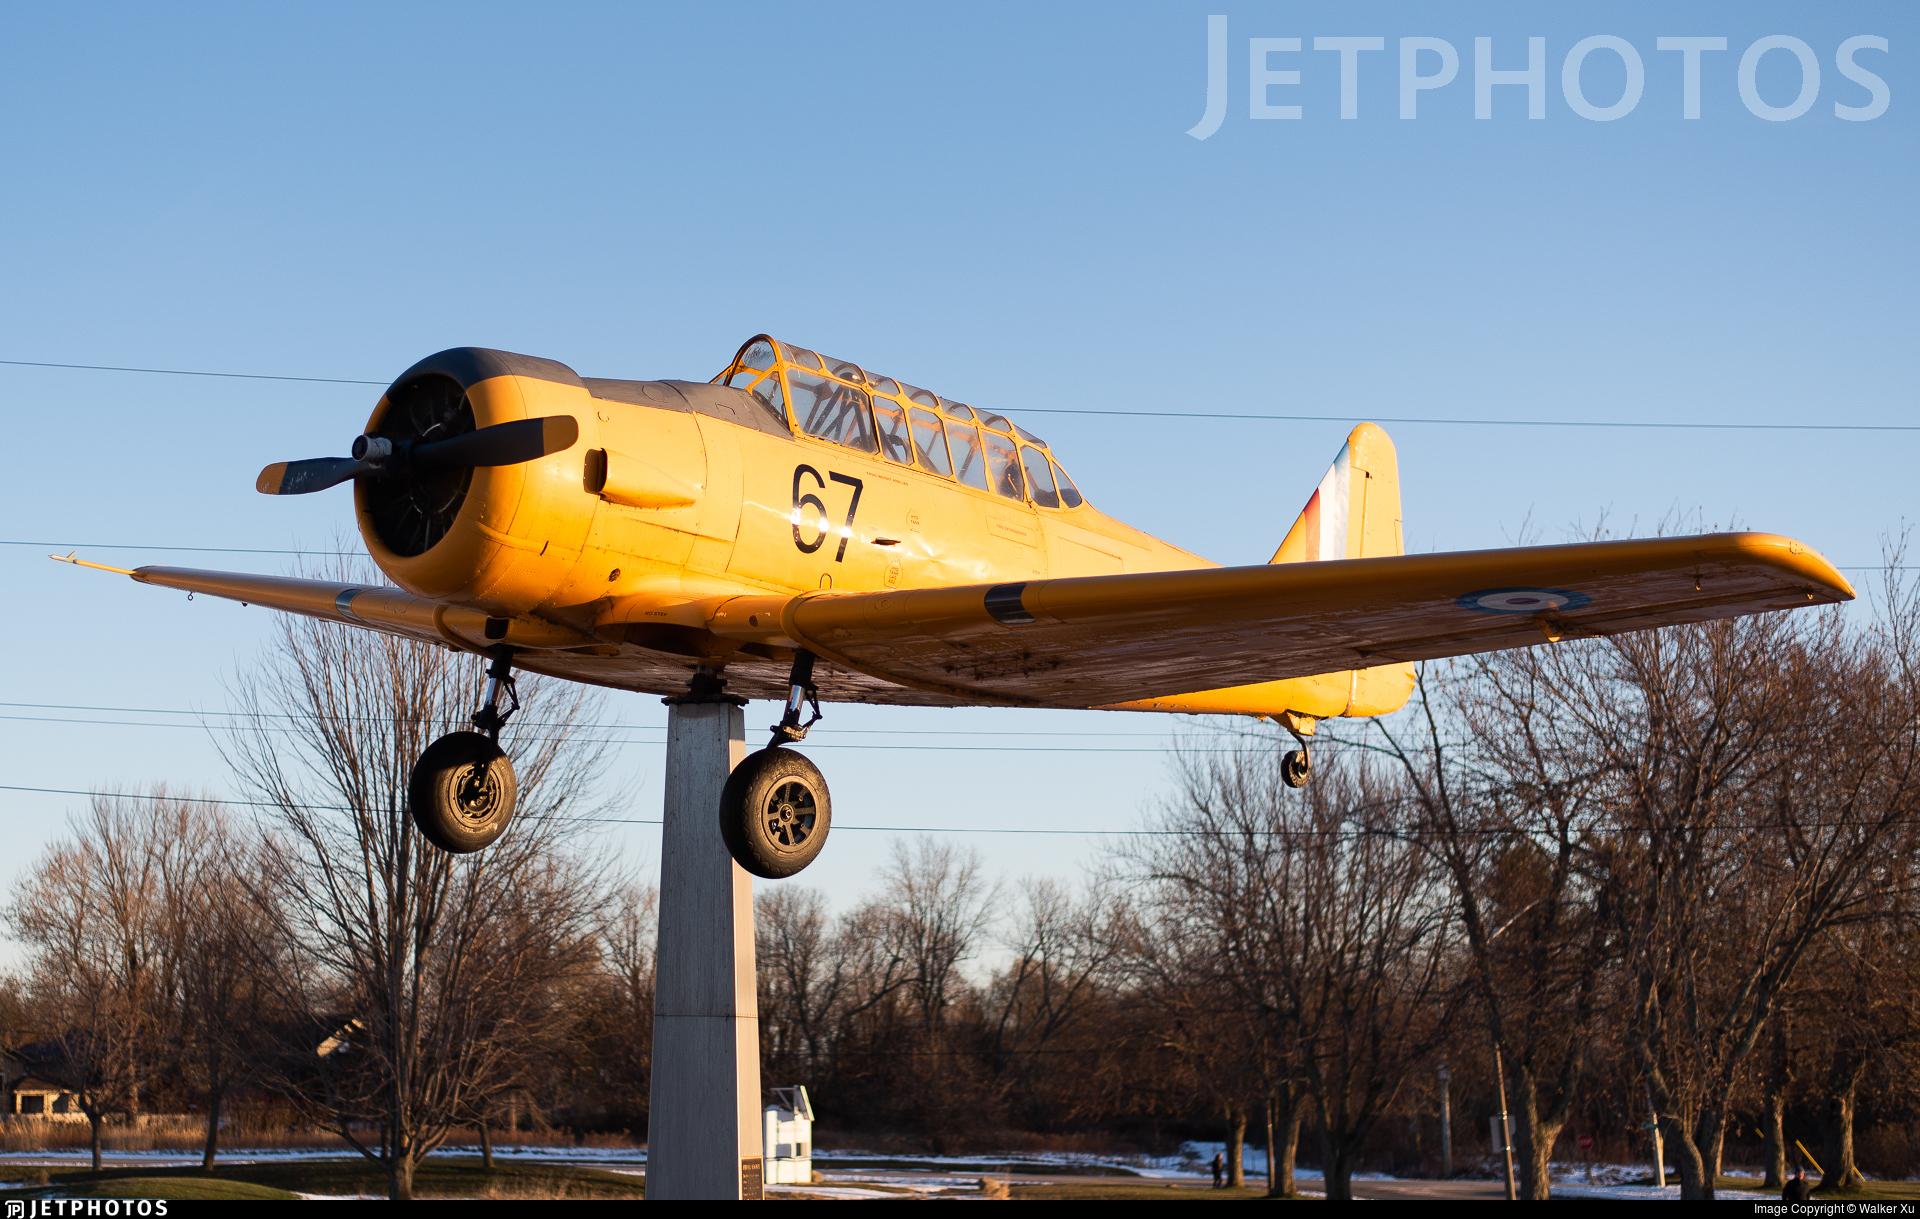 AJ693 - North American AT-6 Harvard II - Canada - Royal Canadian Air Force (RCAF)